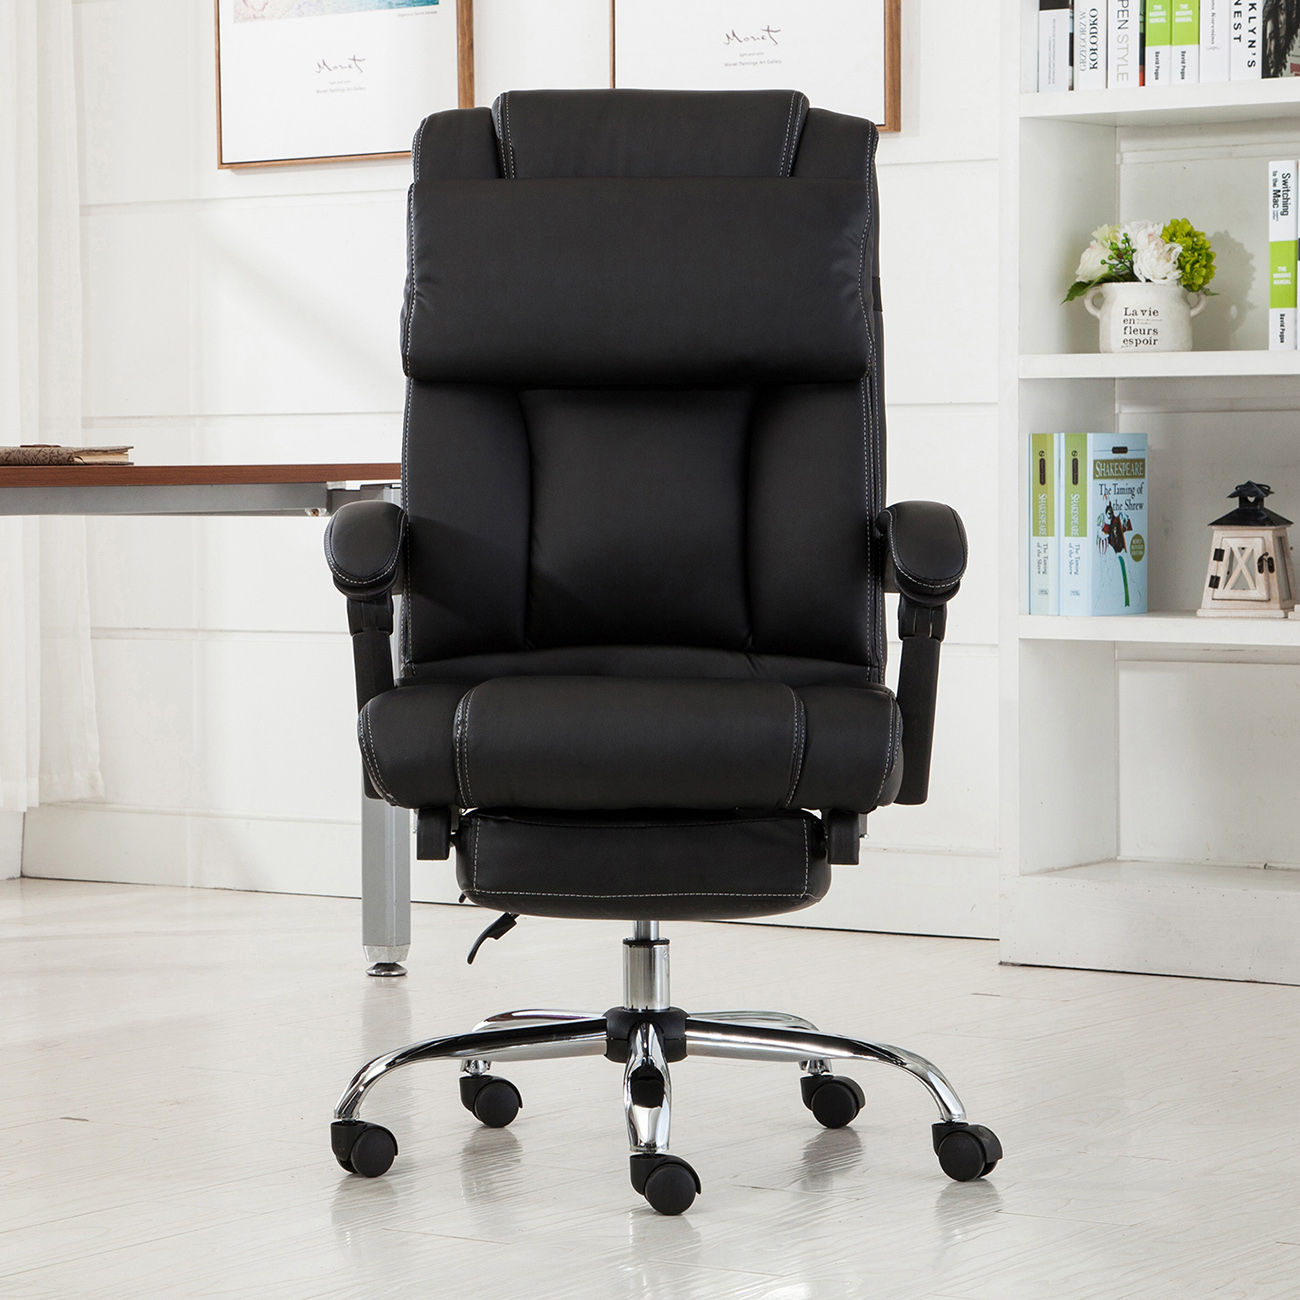 Executive Reclining Office Chair Ergonomic High Back ...